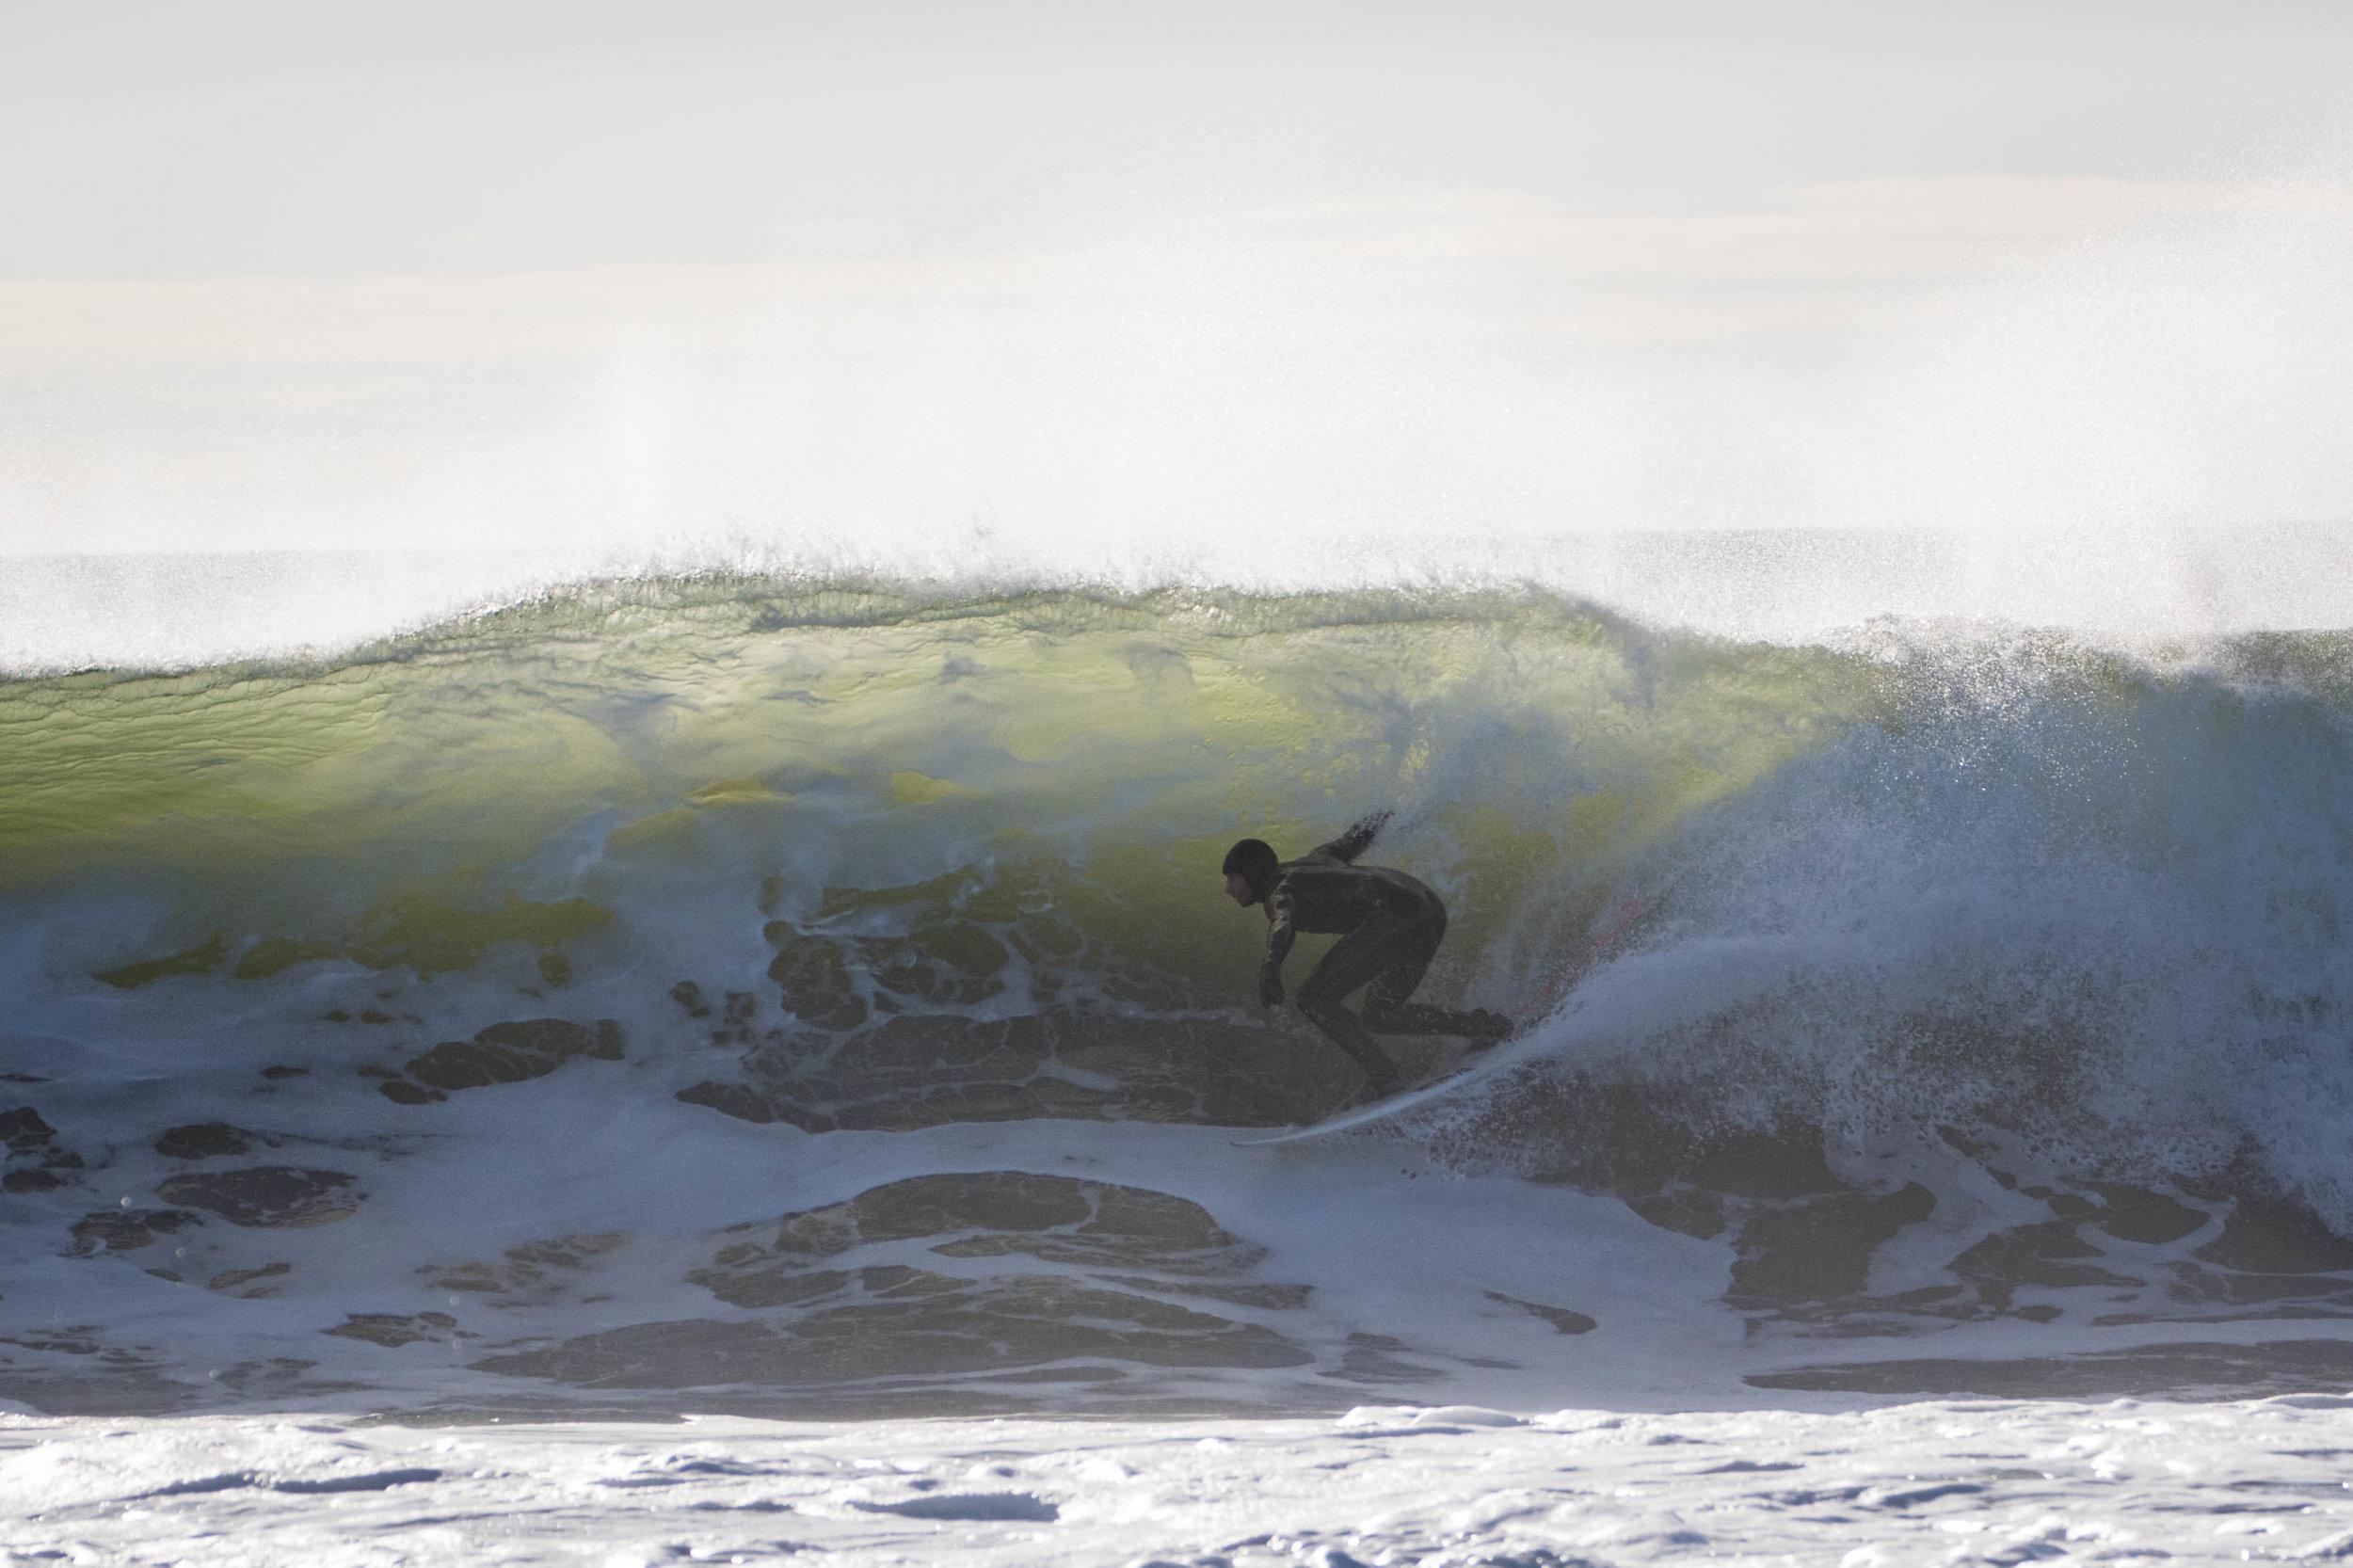 4-26-18 Mantoloking Wave 22.jpg